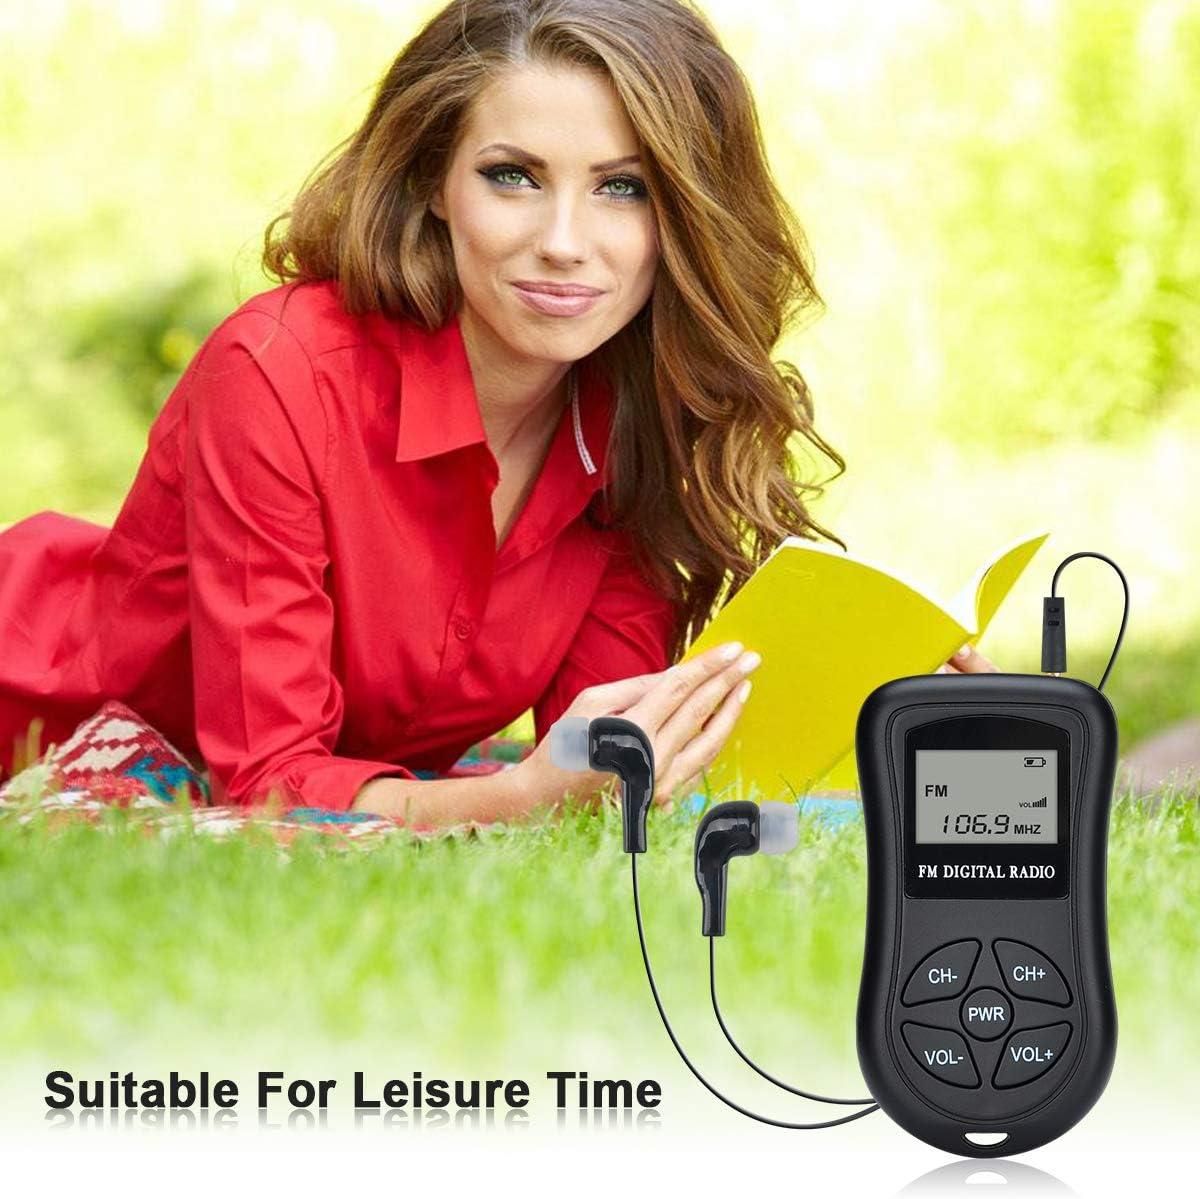 FM Pocket Radio Sdirniy Portable Digital Radio Alarm Clock Mini Digital Tuning Stereo Radio Receiver with 3.5mm Headphone Jack Operated by 2 AAA Battery for Senior